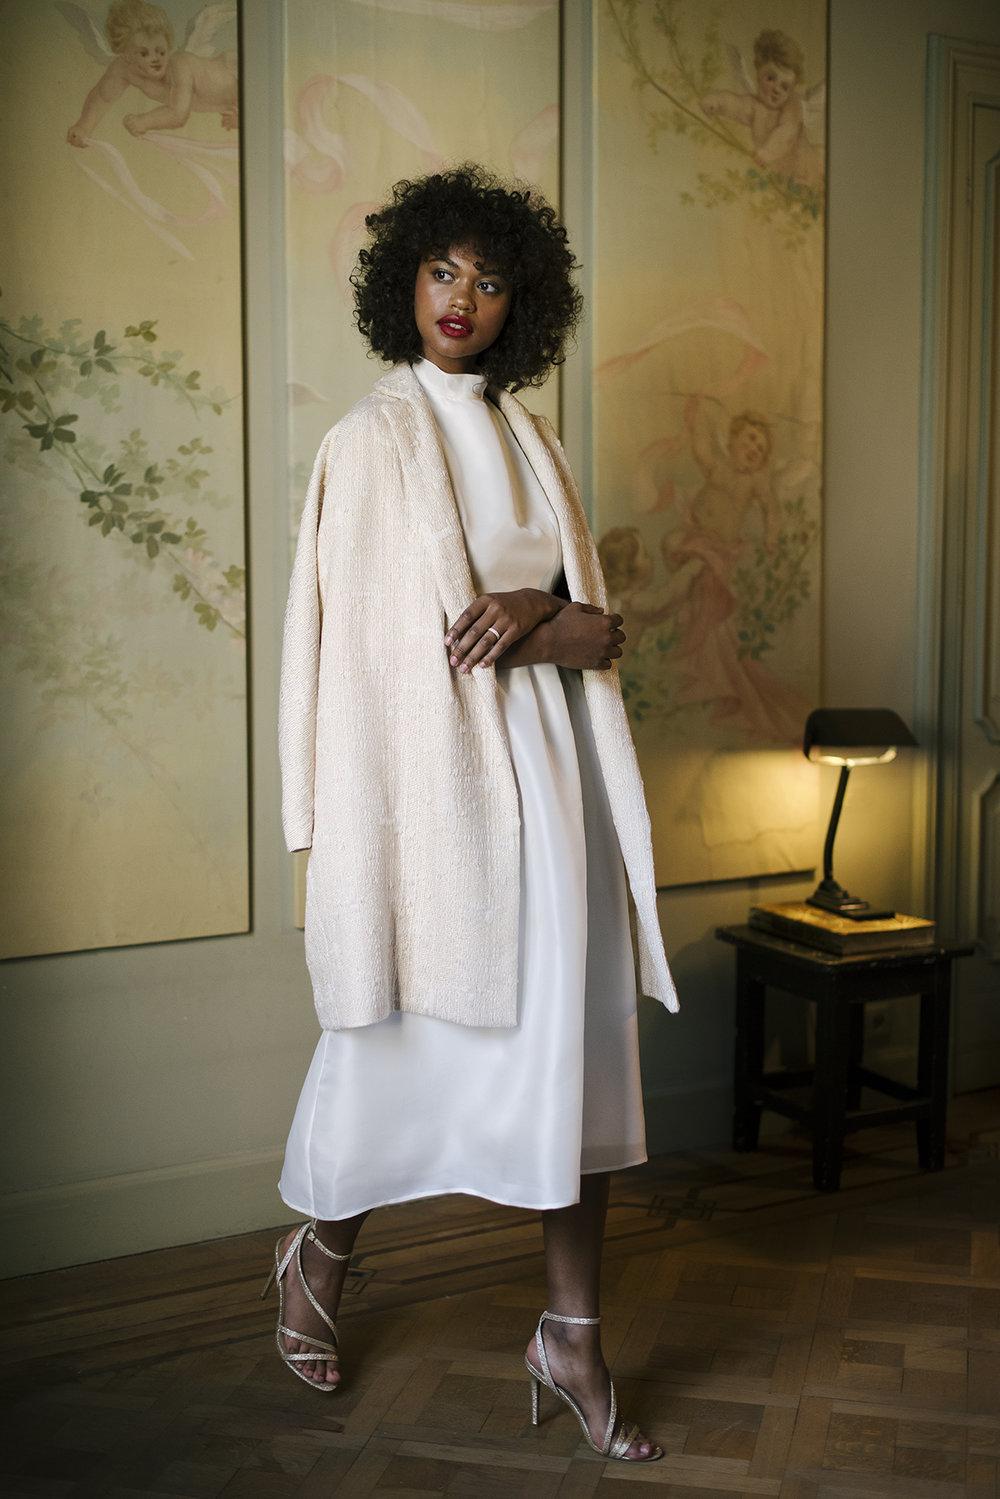 valentine-avoh-robe-mariee-ava-wedding-dress-bruxelles-photo-elodie-timmermans-18.jpg